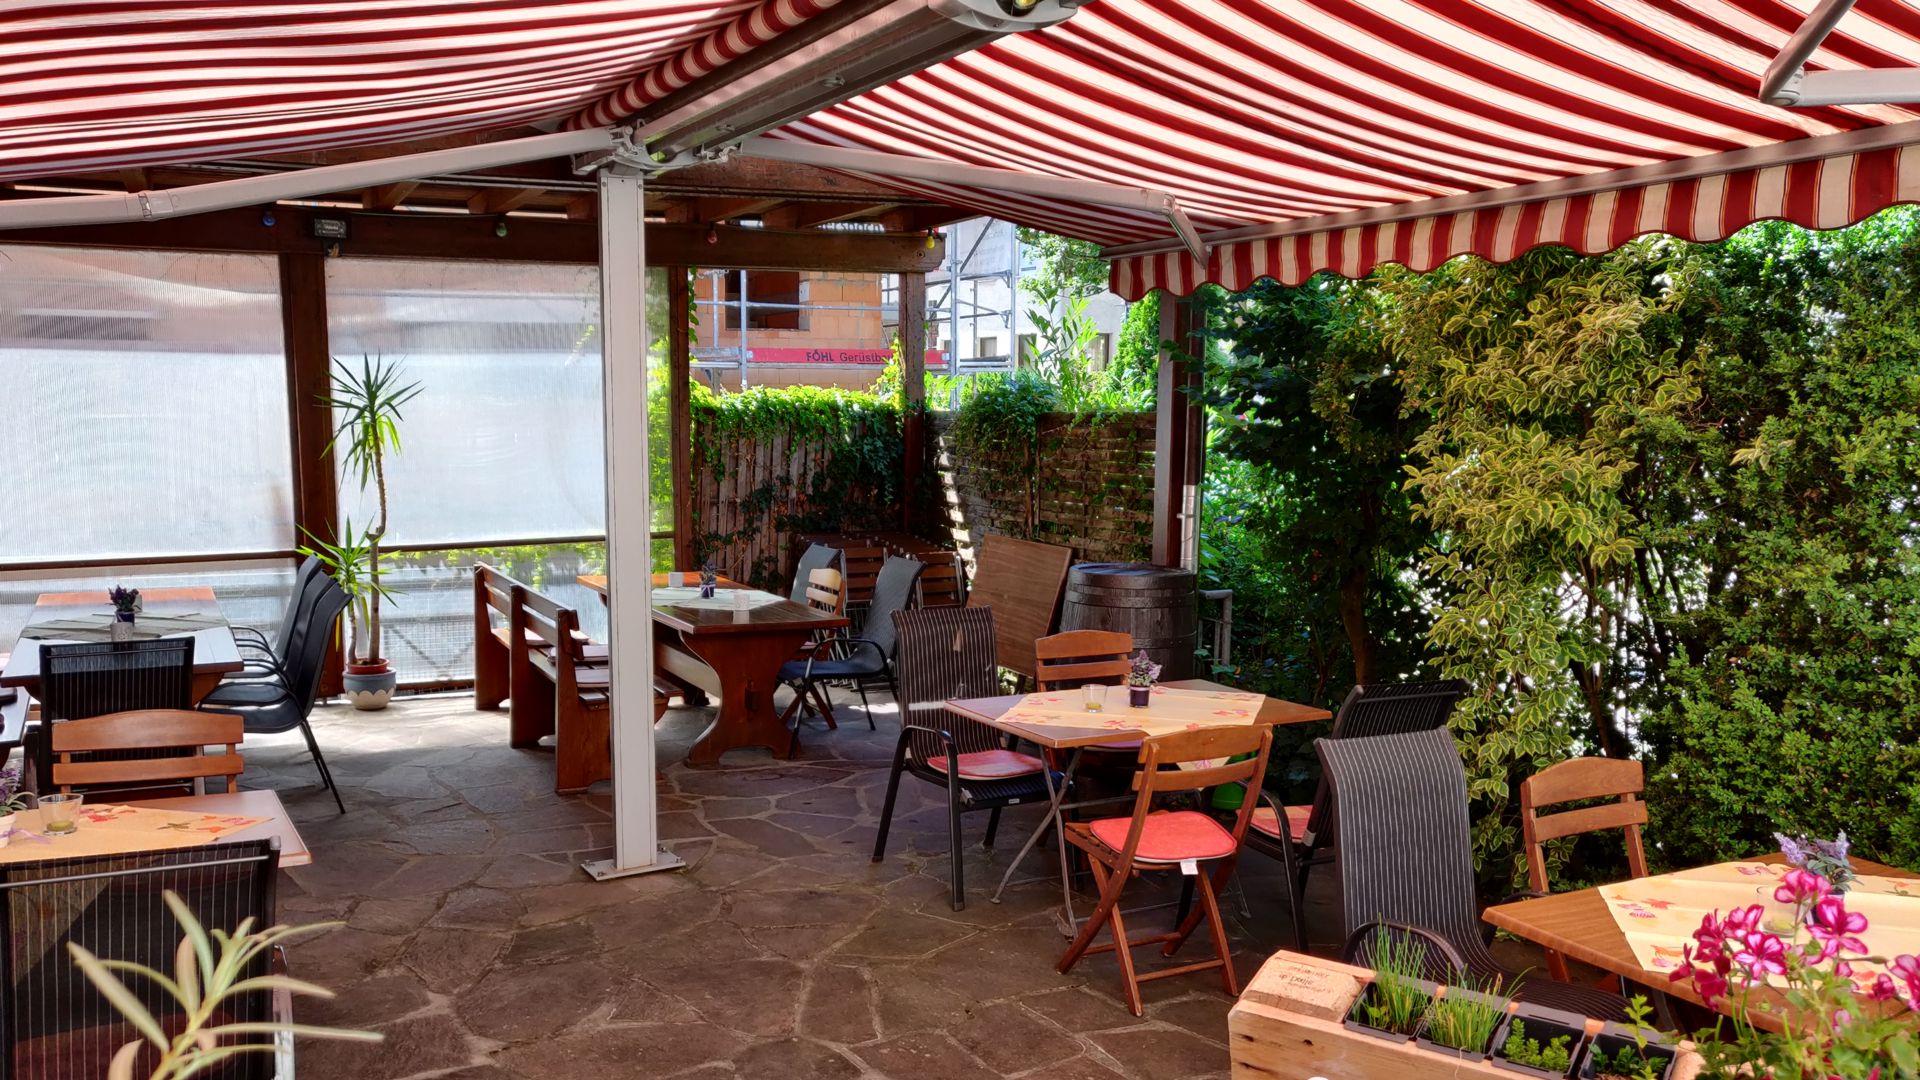 Biergarten & Terrasse